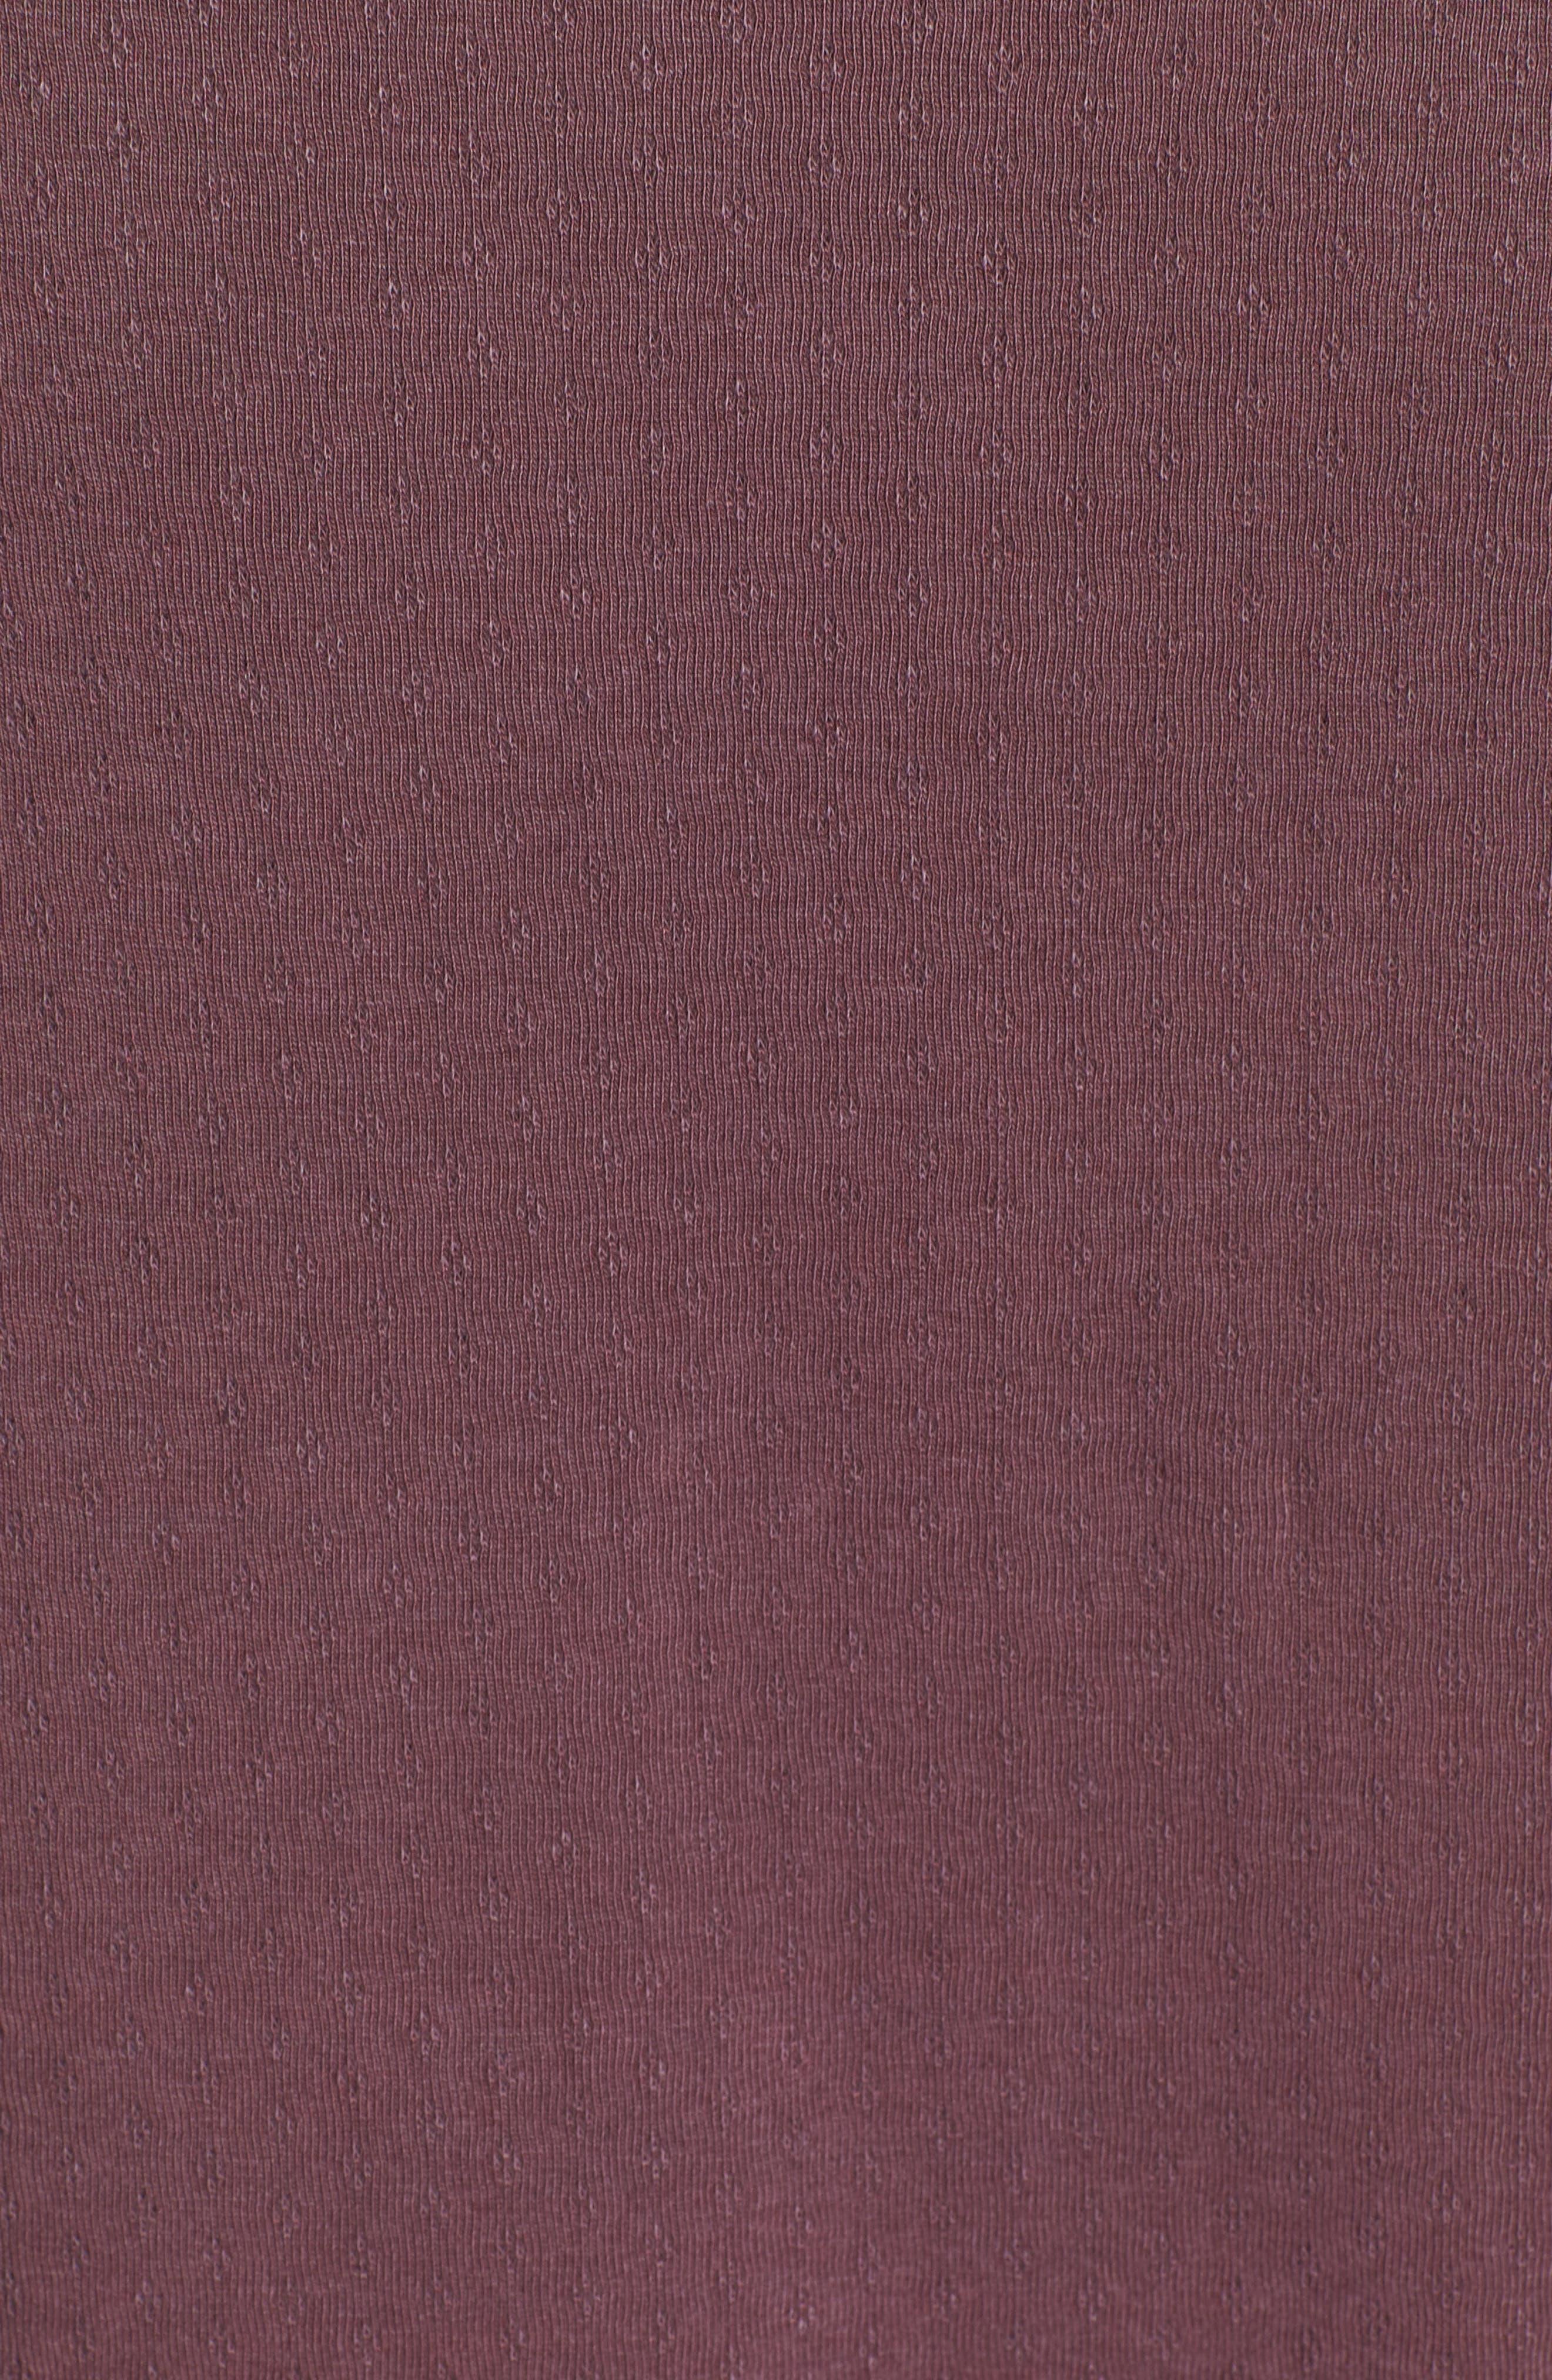 Pointelle Raw Edge Twist Cotton Top,                             Alternate thumbnail 5, color,                             931